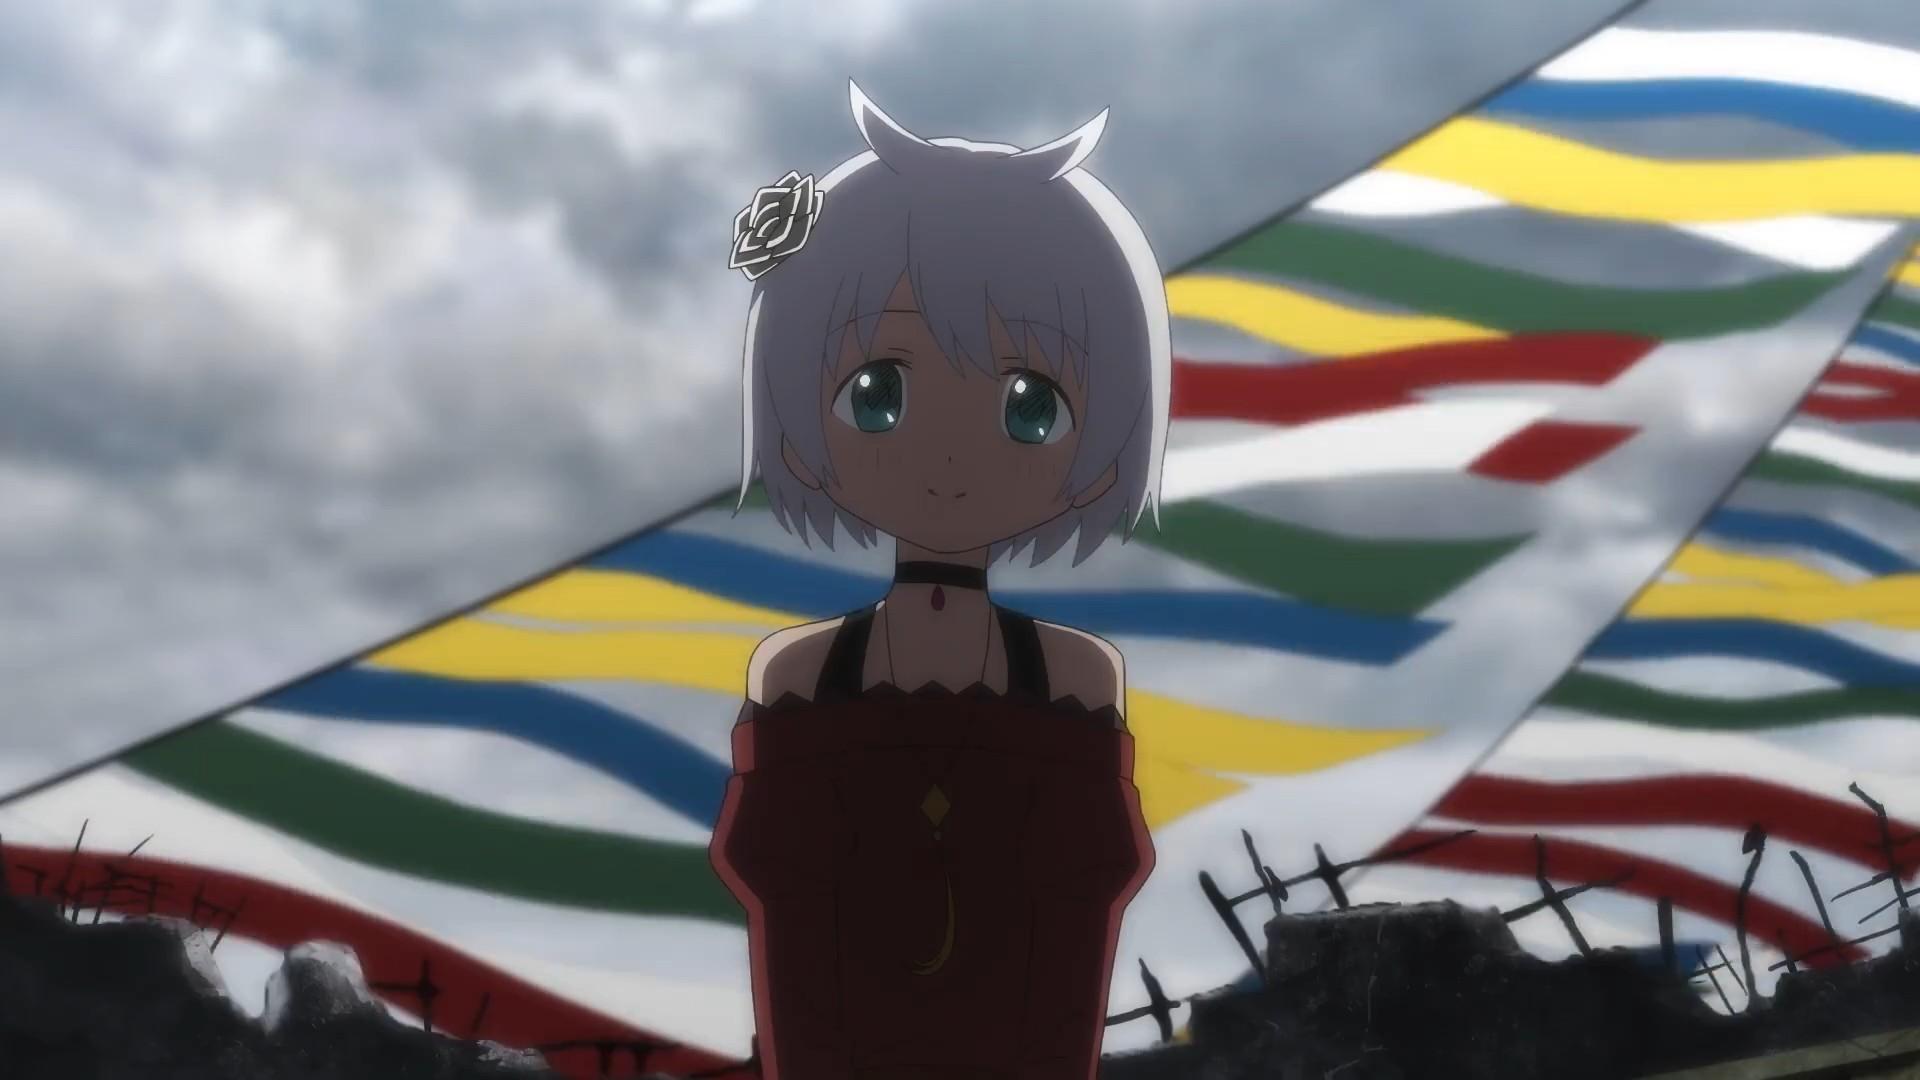 TV动画《魔法纪录 第二季》新PV公开,将于7月31日开始播出- ACG17.COM